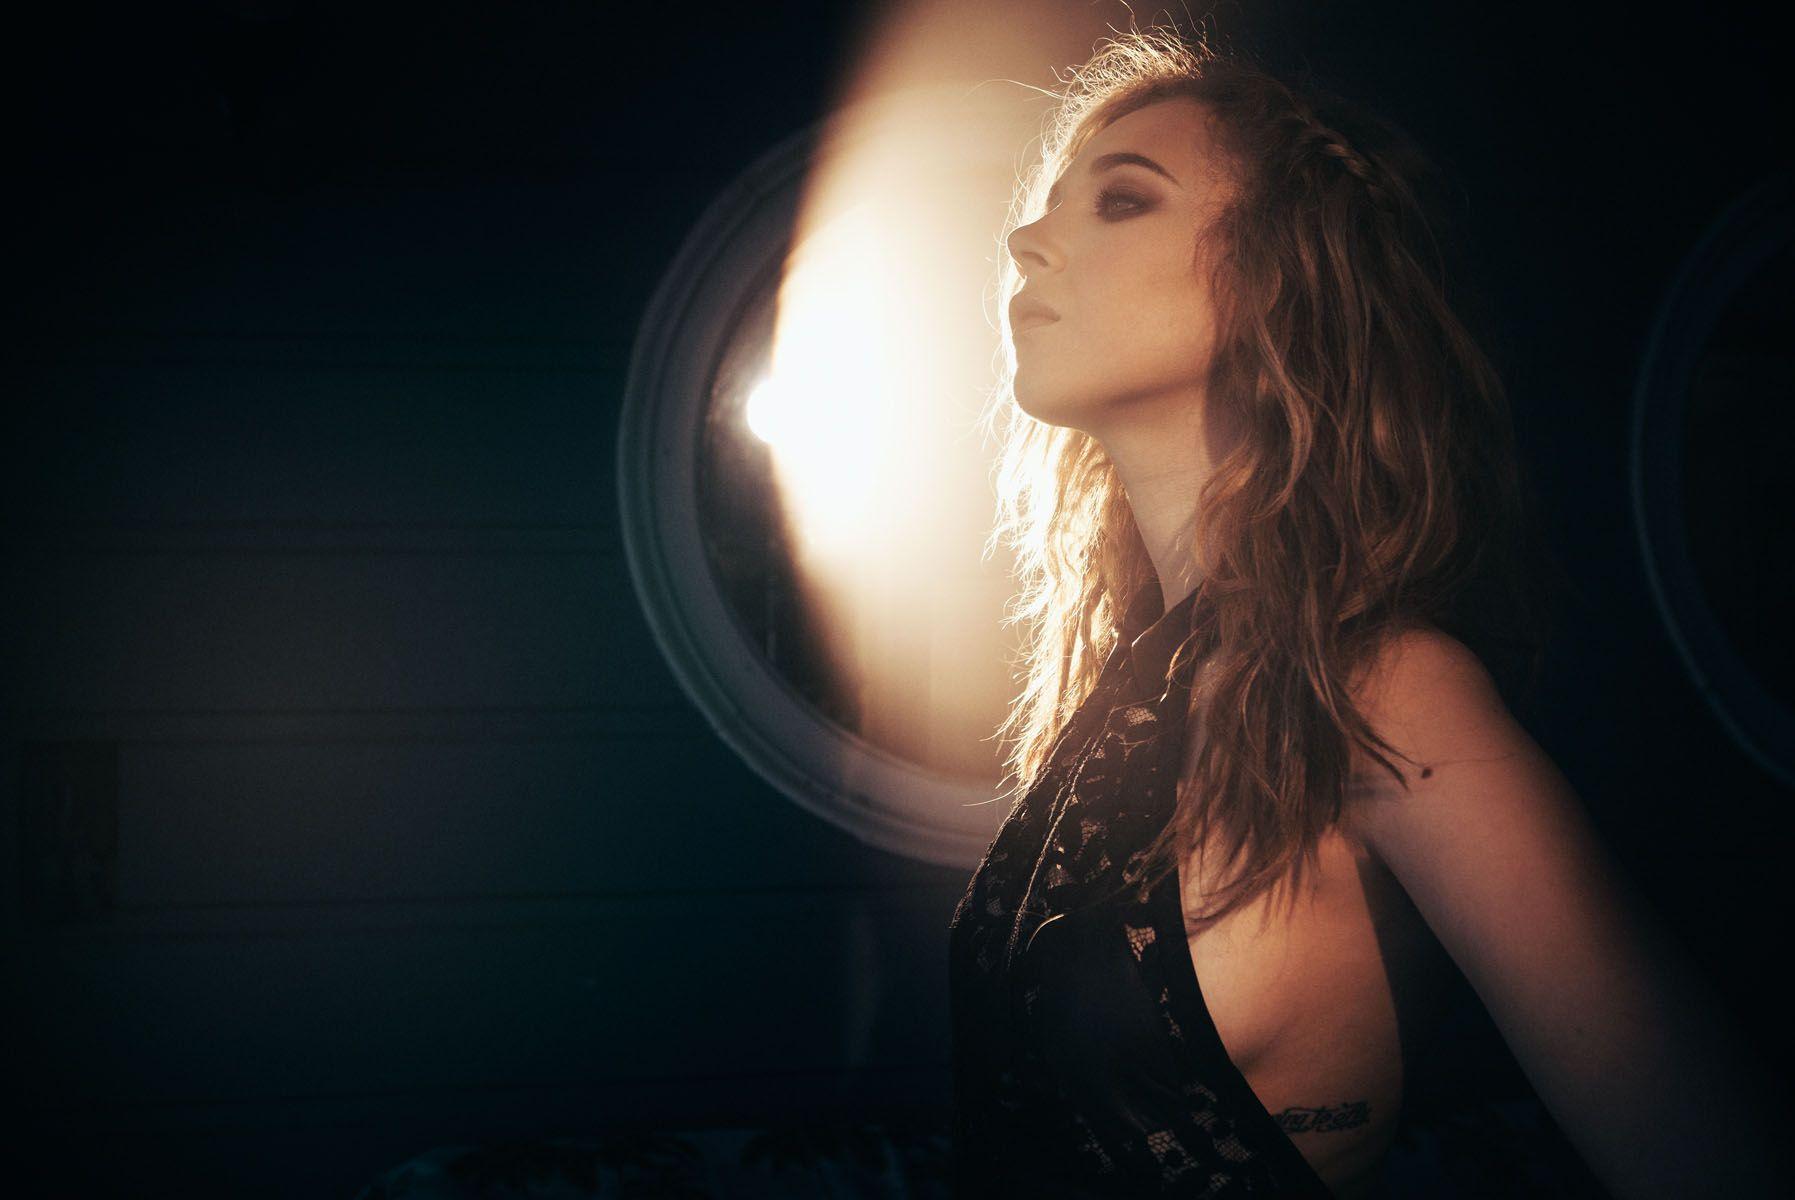 Leaked Elisa De Panicis Agnelli nudes (46 photos), Ass, Leaked, Boobs, see through 2006